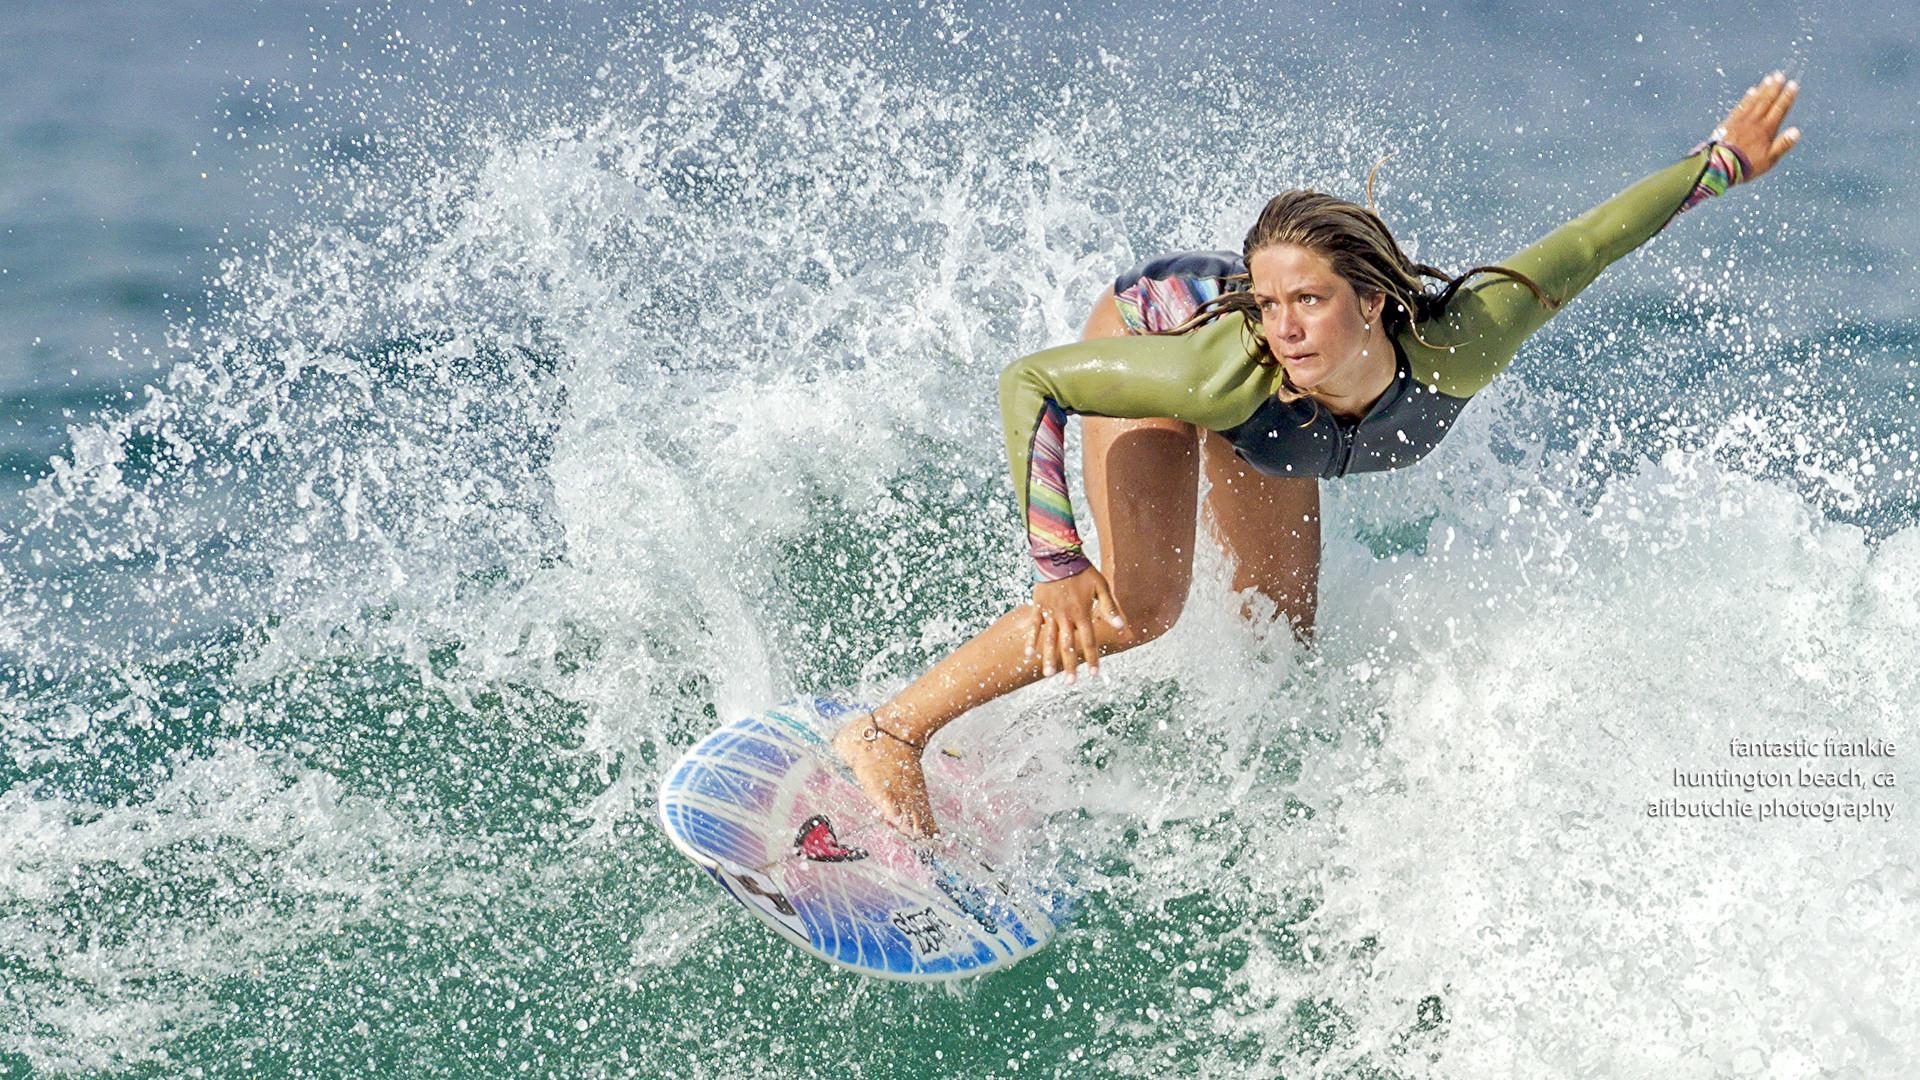 Wallpaper suit neuprene Girls Sport Surfing Spray Water 1920×1080